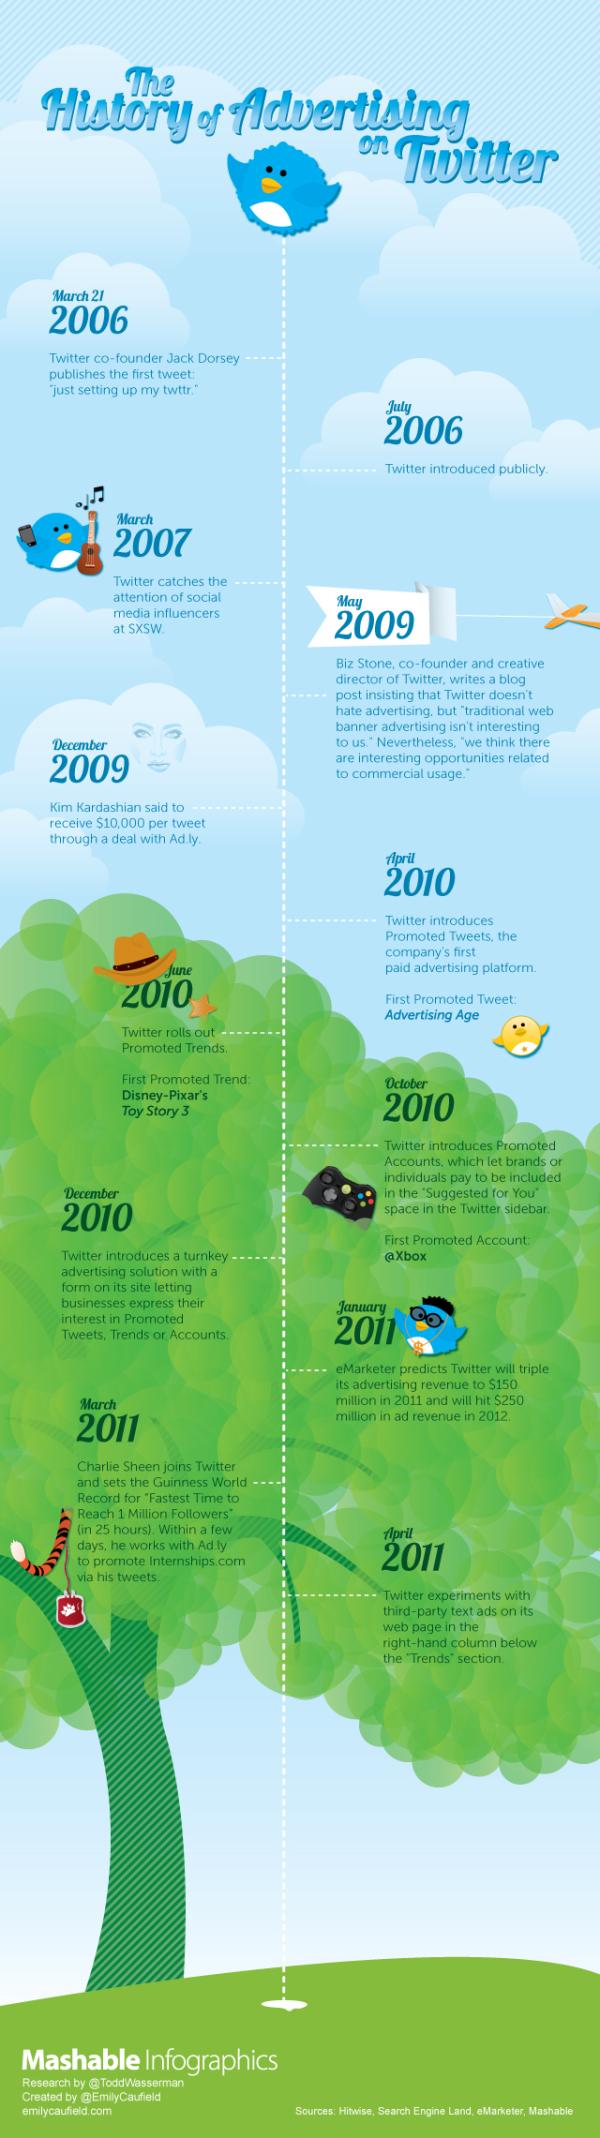 Mashable History of Twitter Advertising Infographic resized 600